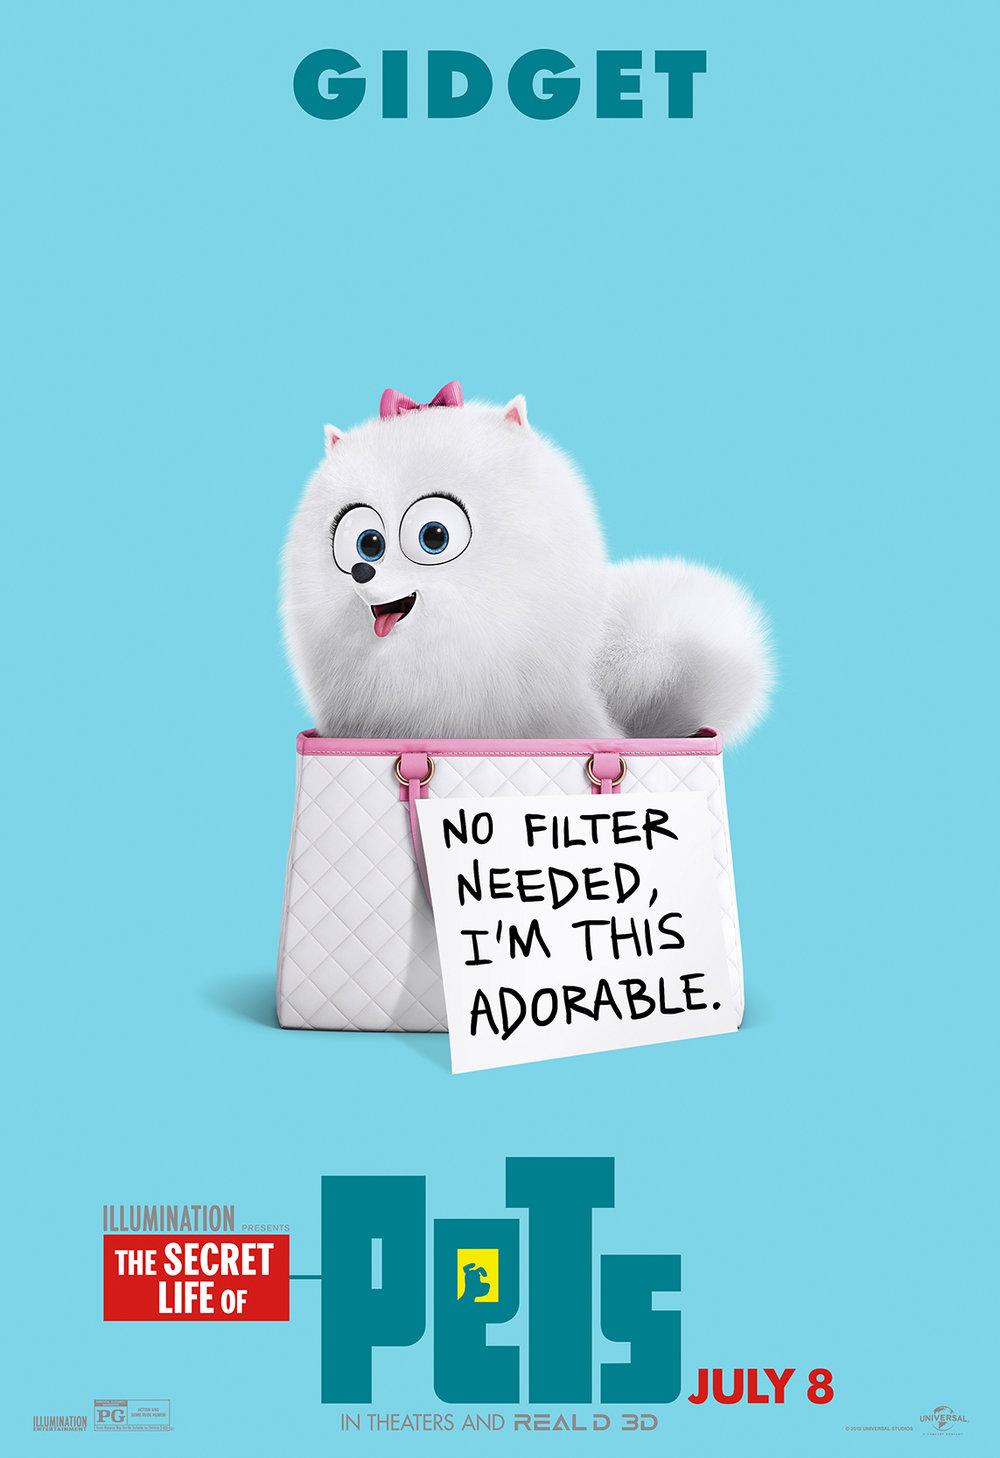 Pets_Wildpost_Gidget_100dpi.jpg